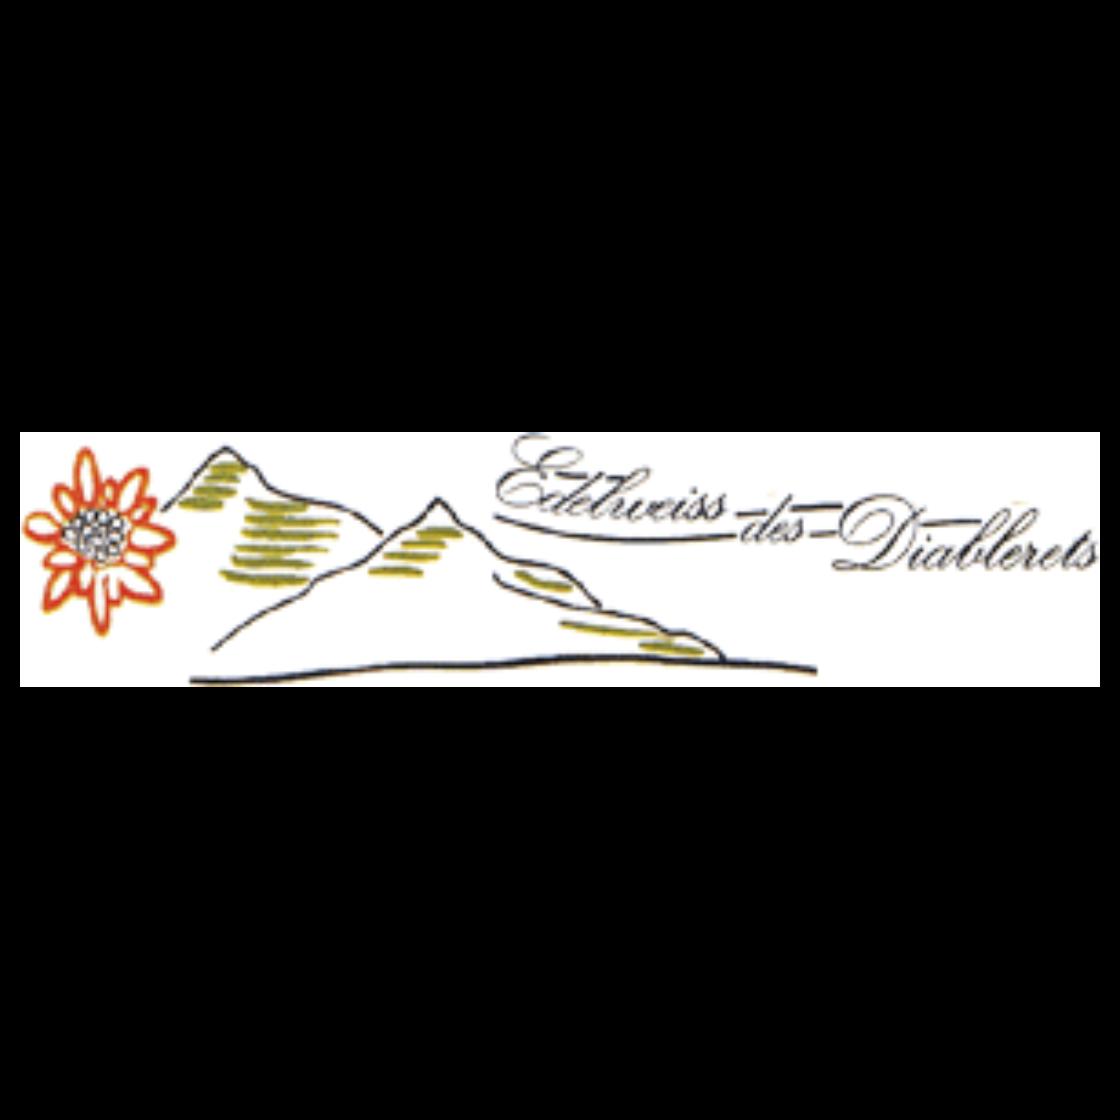 Logo EDELWEISS DES DIABLERETS